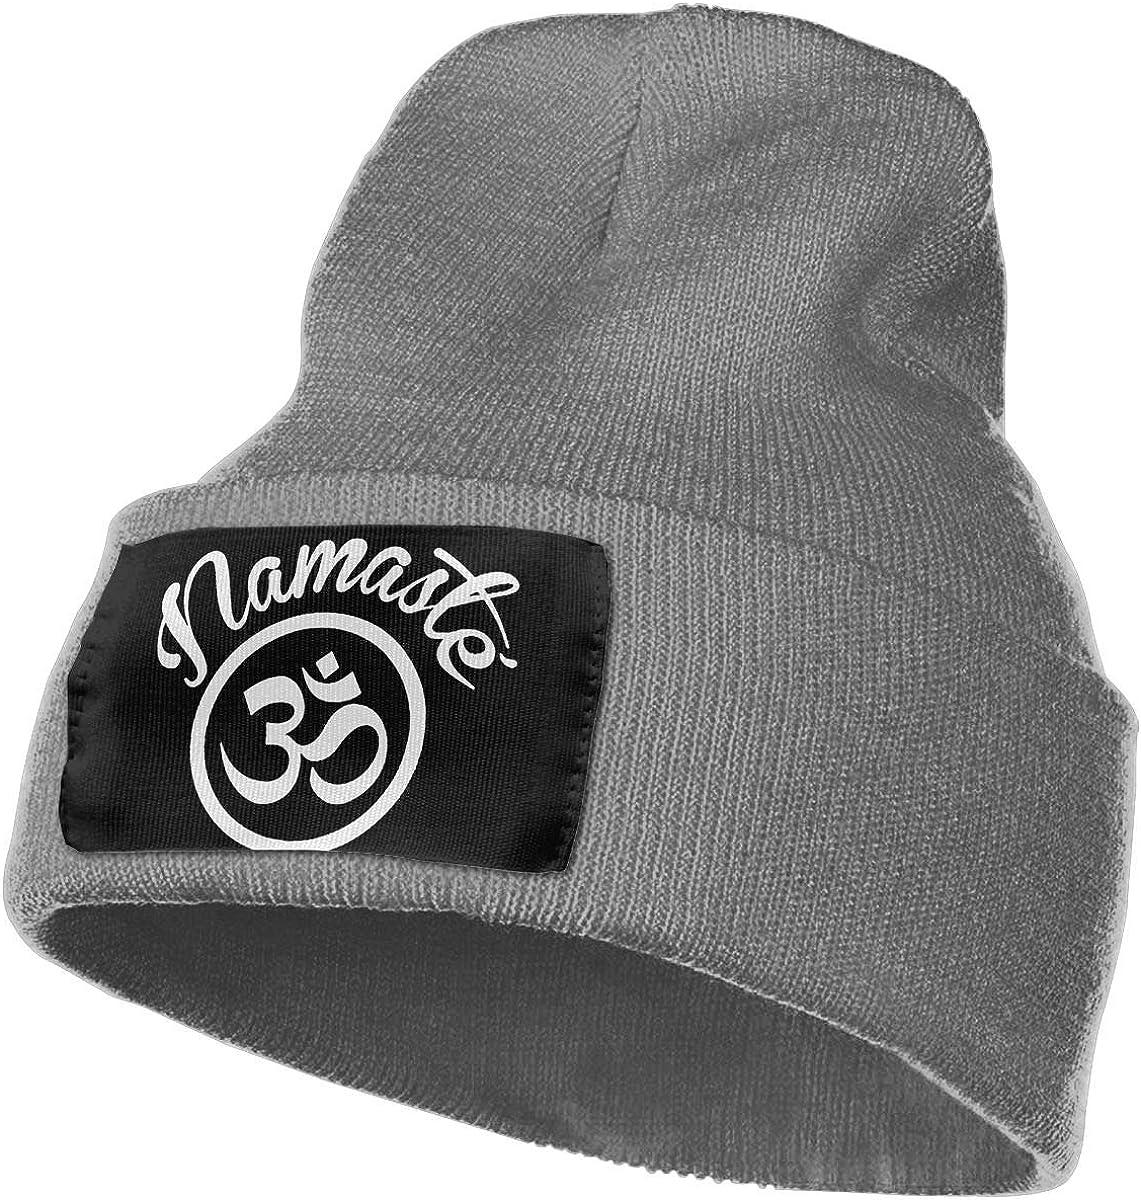 SLADDD1 Namaste with Om Symbol Warm Winter Hat Knit Beanie Skull Cap Cuff Beanie Hat Winter Hats for Men /& Women